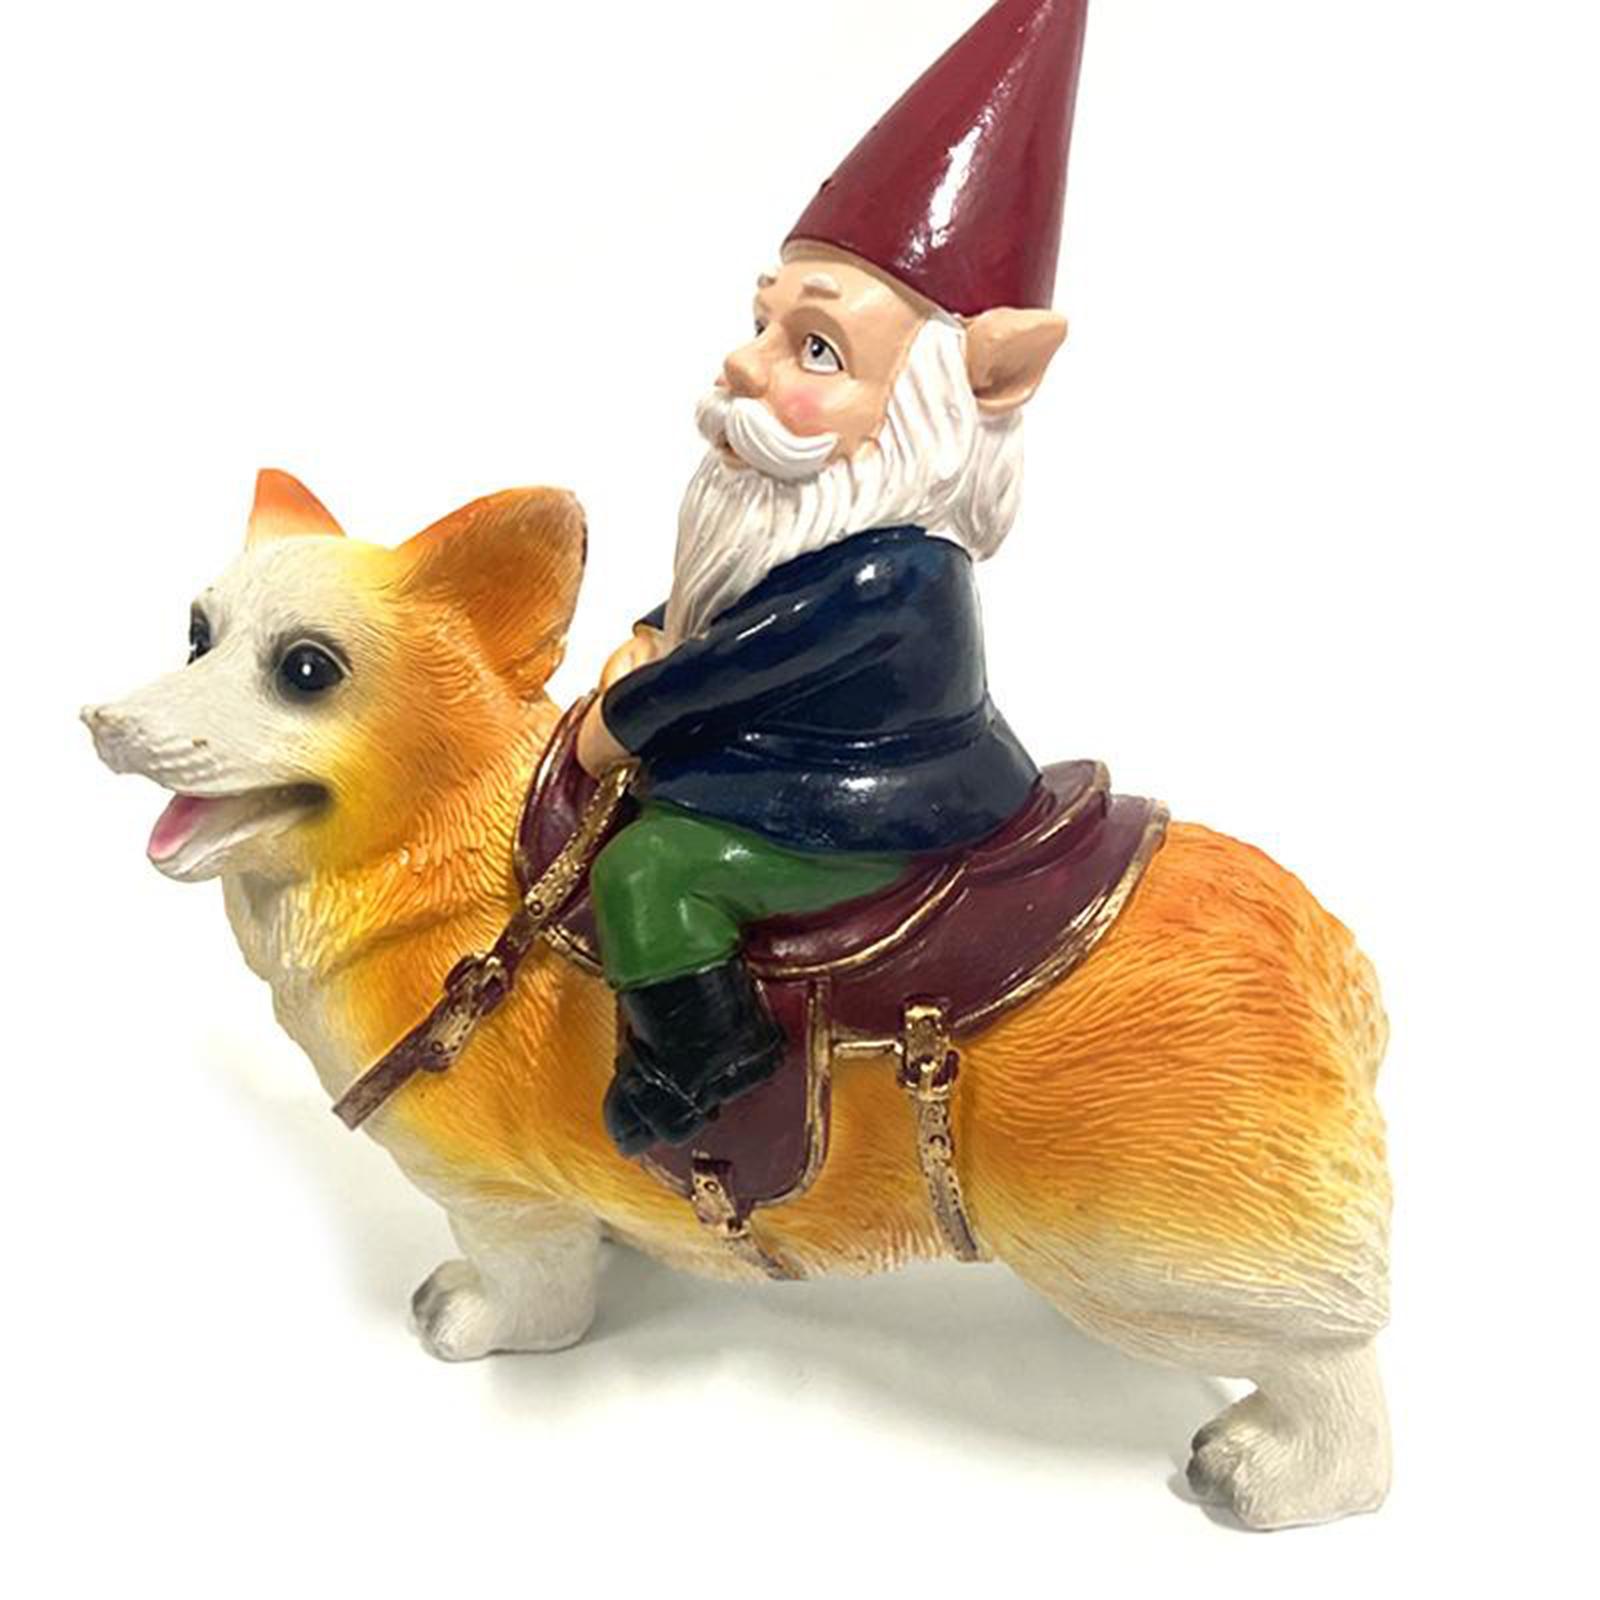 thumbnail 30 - Funny Resin Naughty Garden Gnome Statue Ornaments Villa Home Figurines Decor